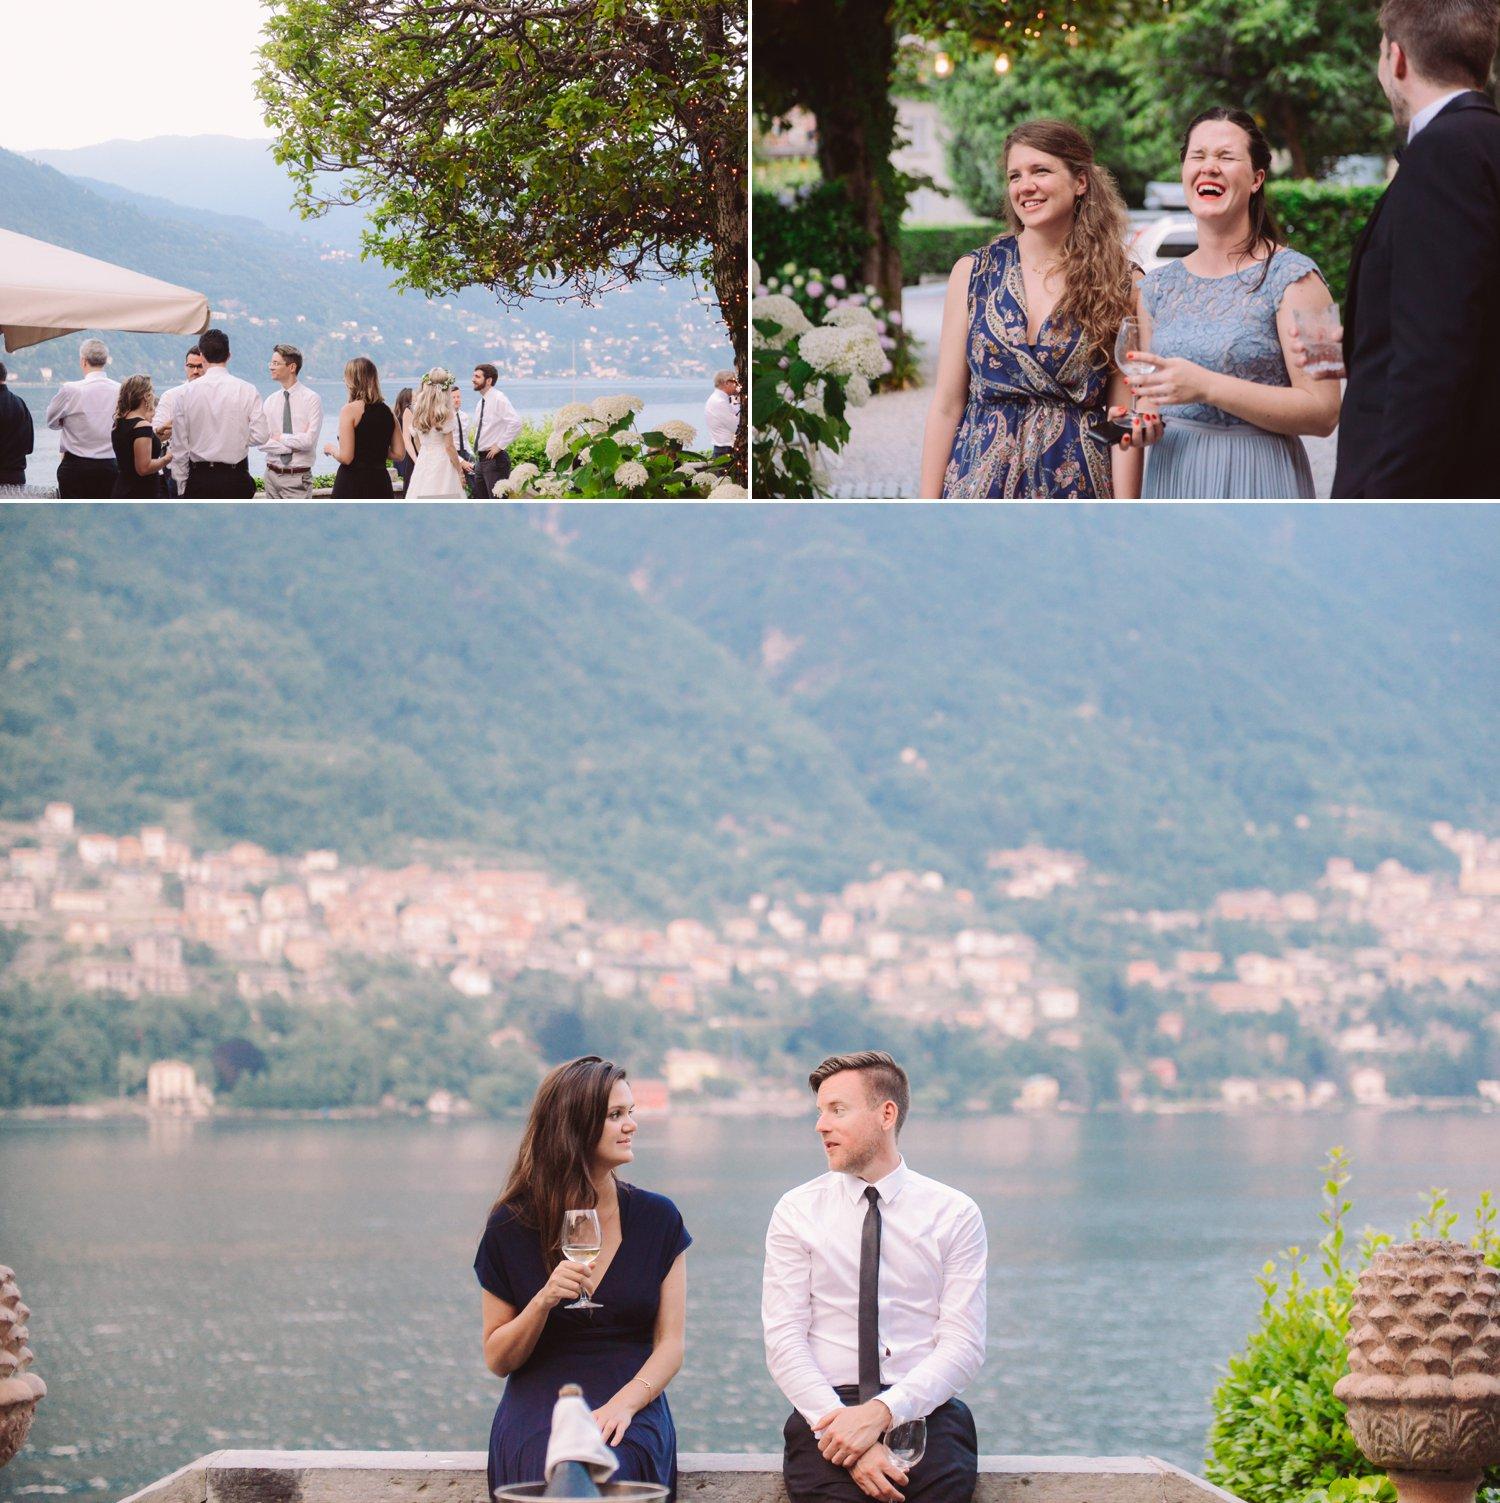 wedding-photographer-lake-como-villa-teodolinda_0110.jpg